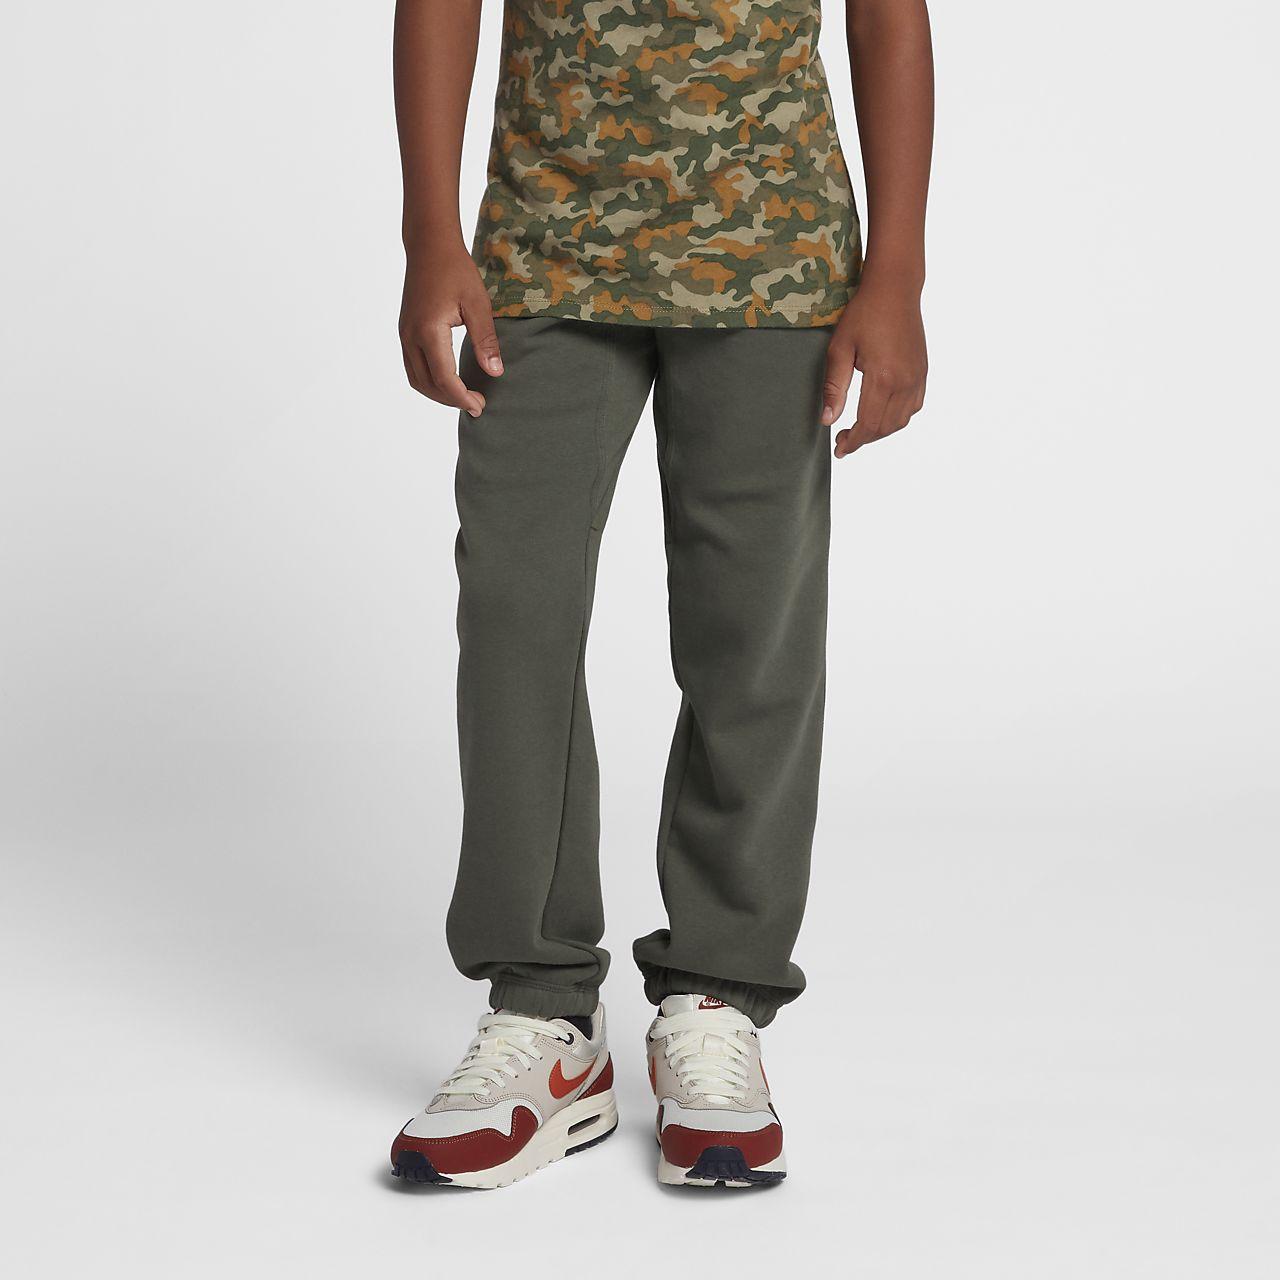 Es Cuffed Xandall Brushed Nois De Pantalons Fleece Nike 0HSvU